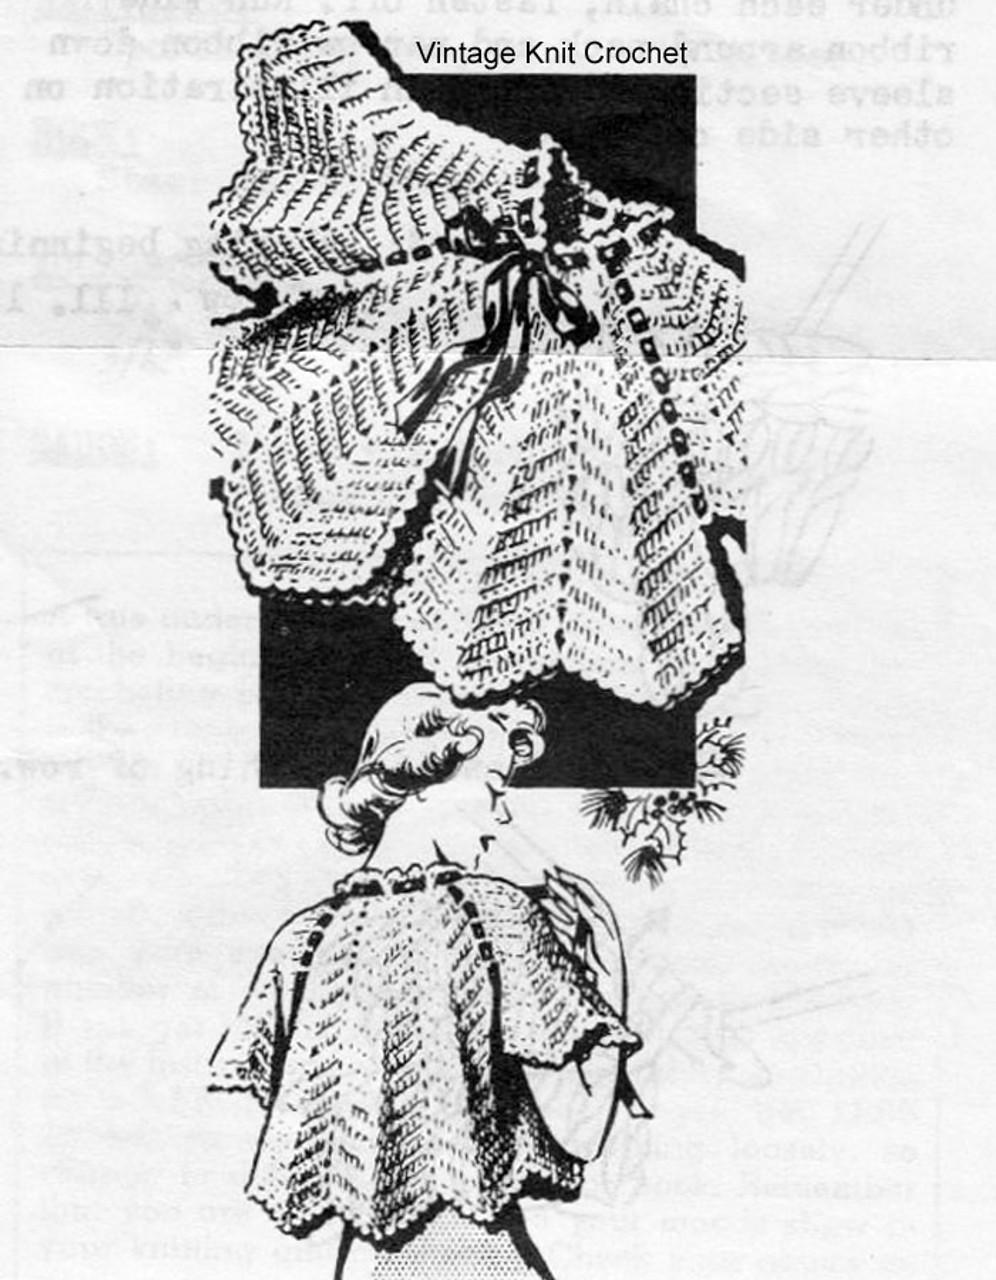 Vintage Crochet Bedjacket Pattern, Anne Cabot 5881